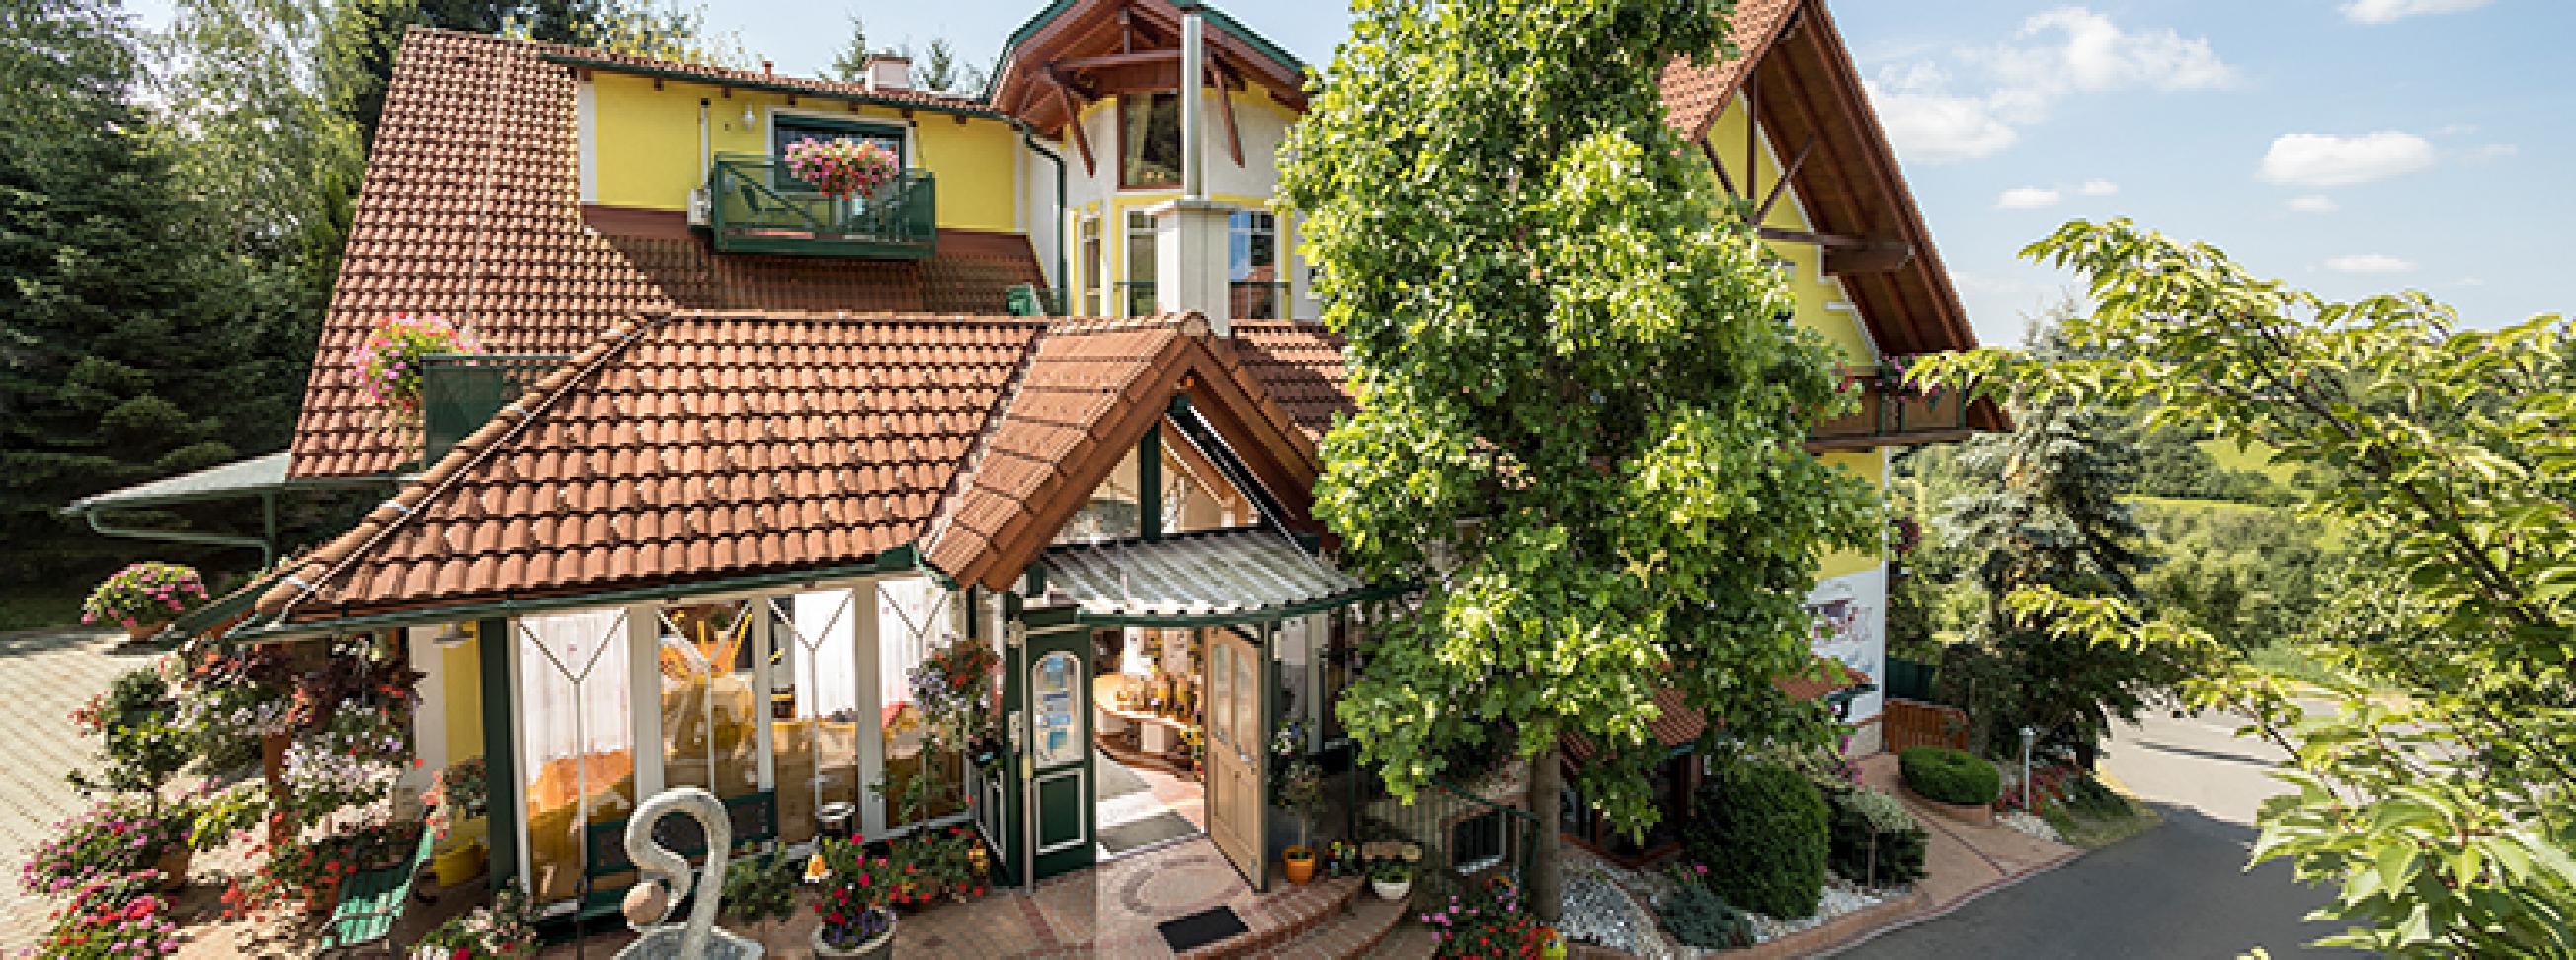 puchasplus-loipersdorf-thermenhof@2x.png